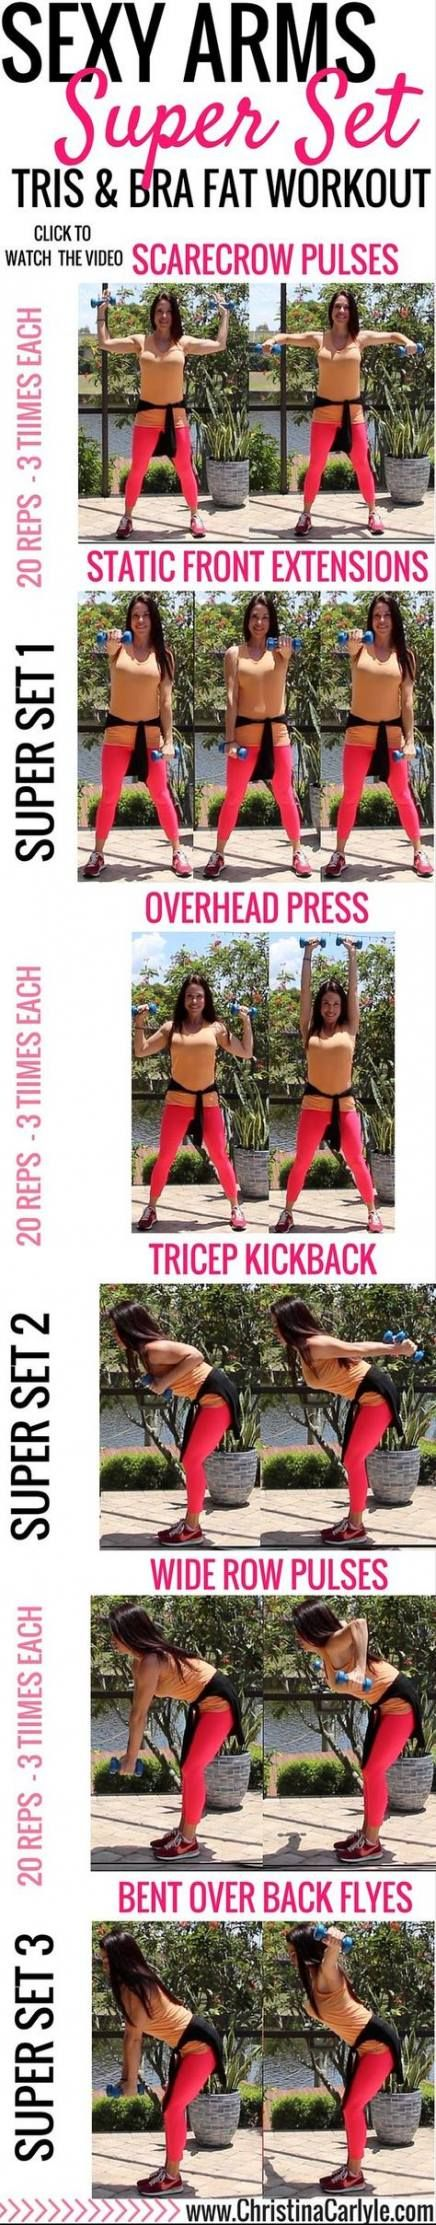 Best Fitness Training Plan Venus Factor 38+ Ideas #fitness